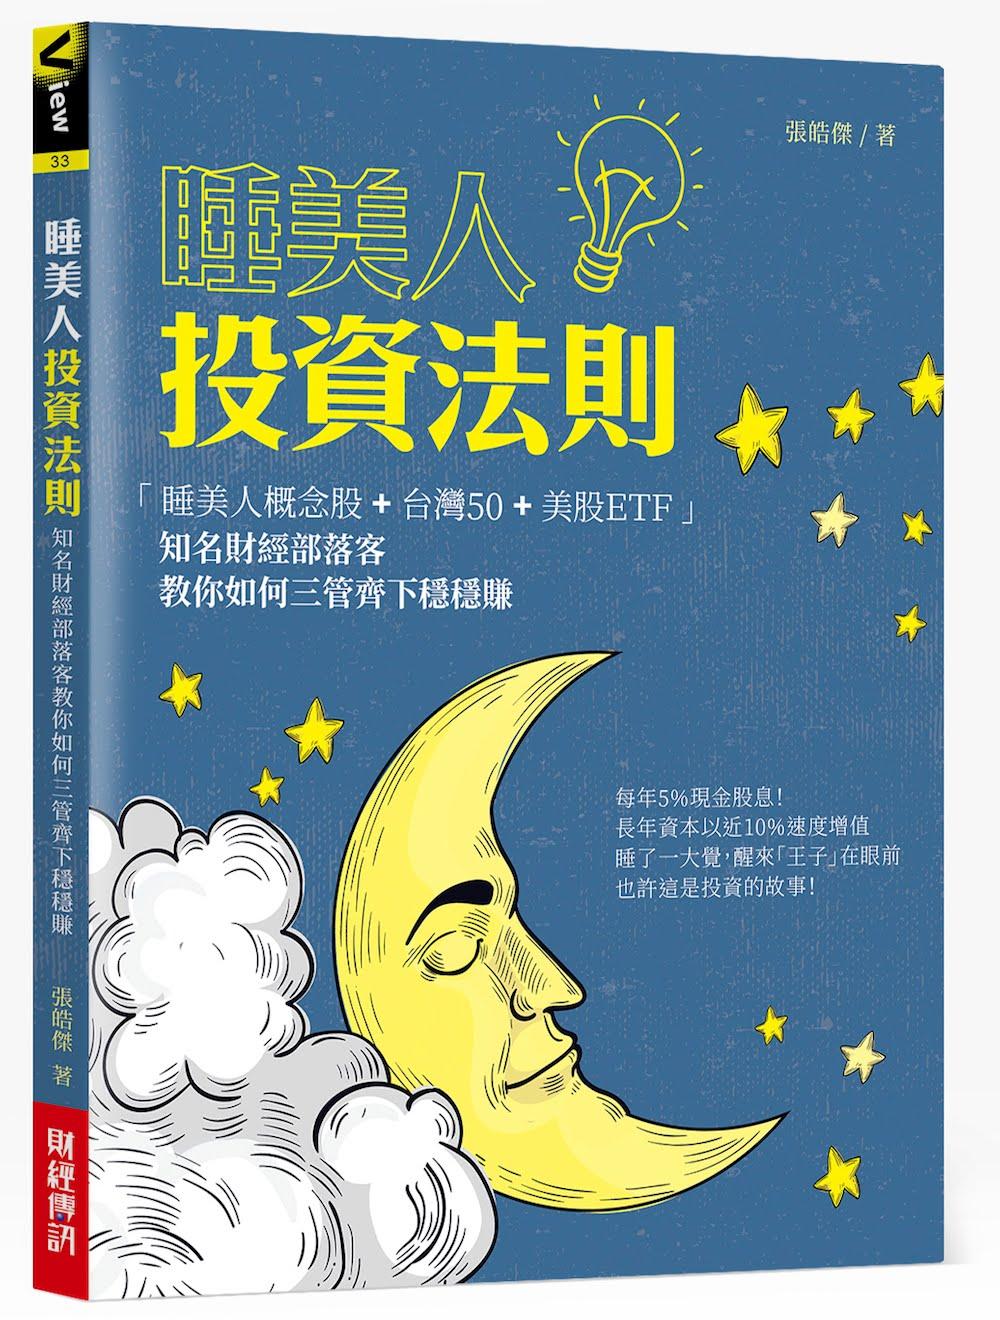 【 HC 新書出版-睡美人投資法則】